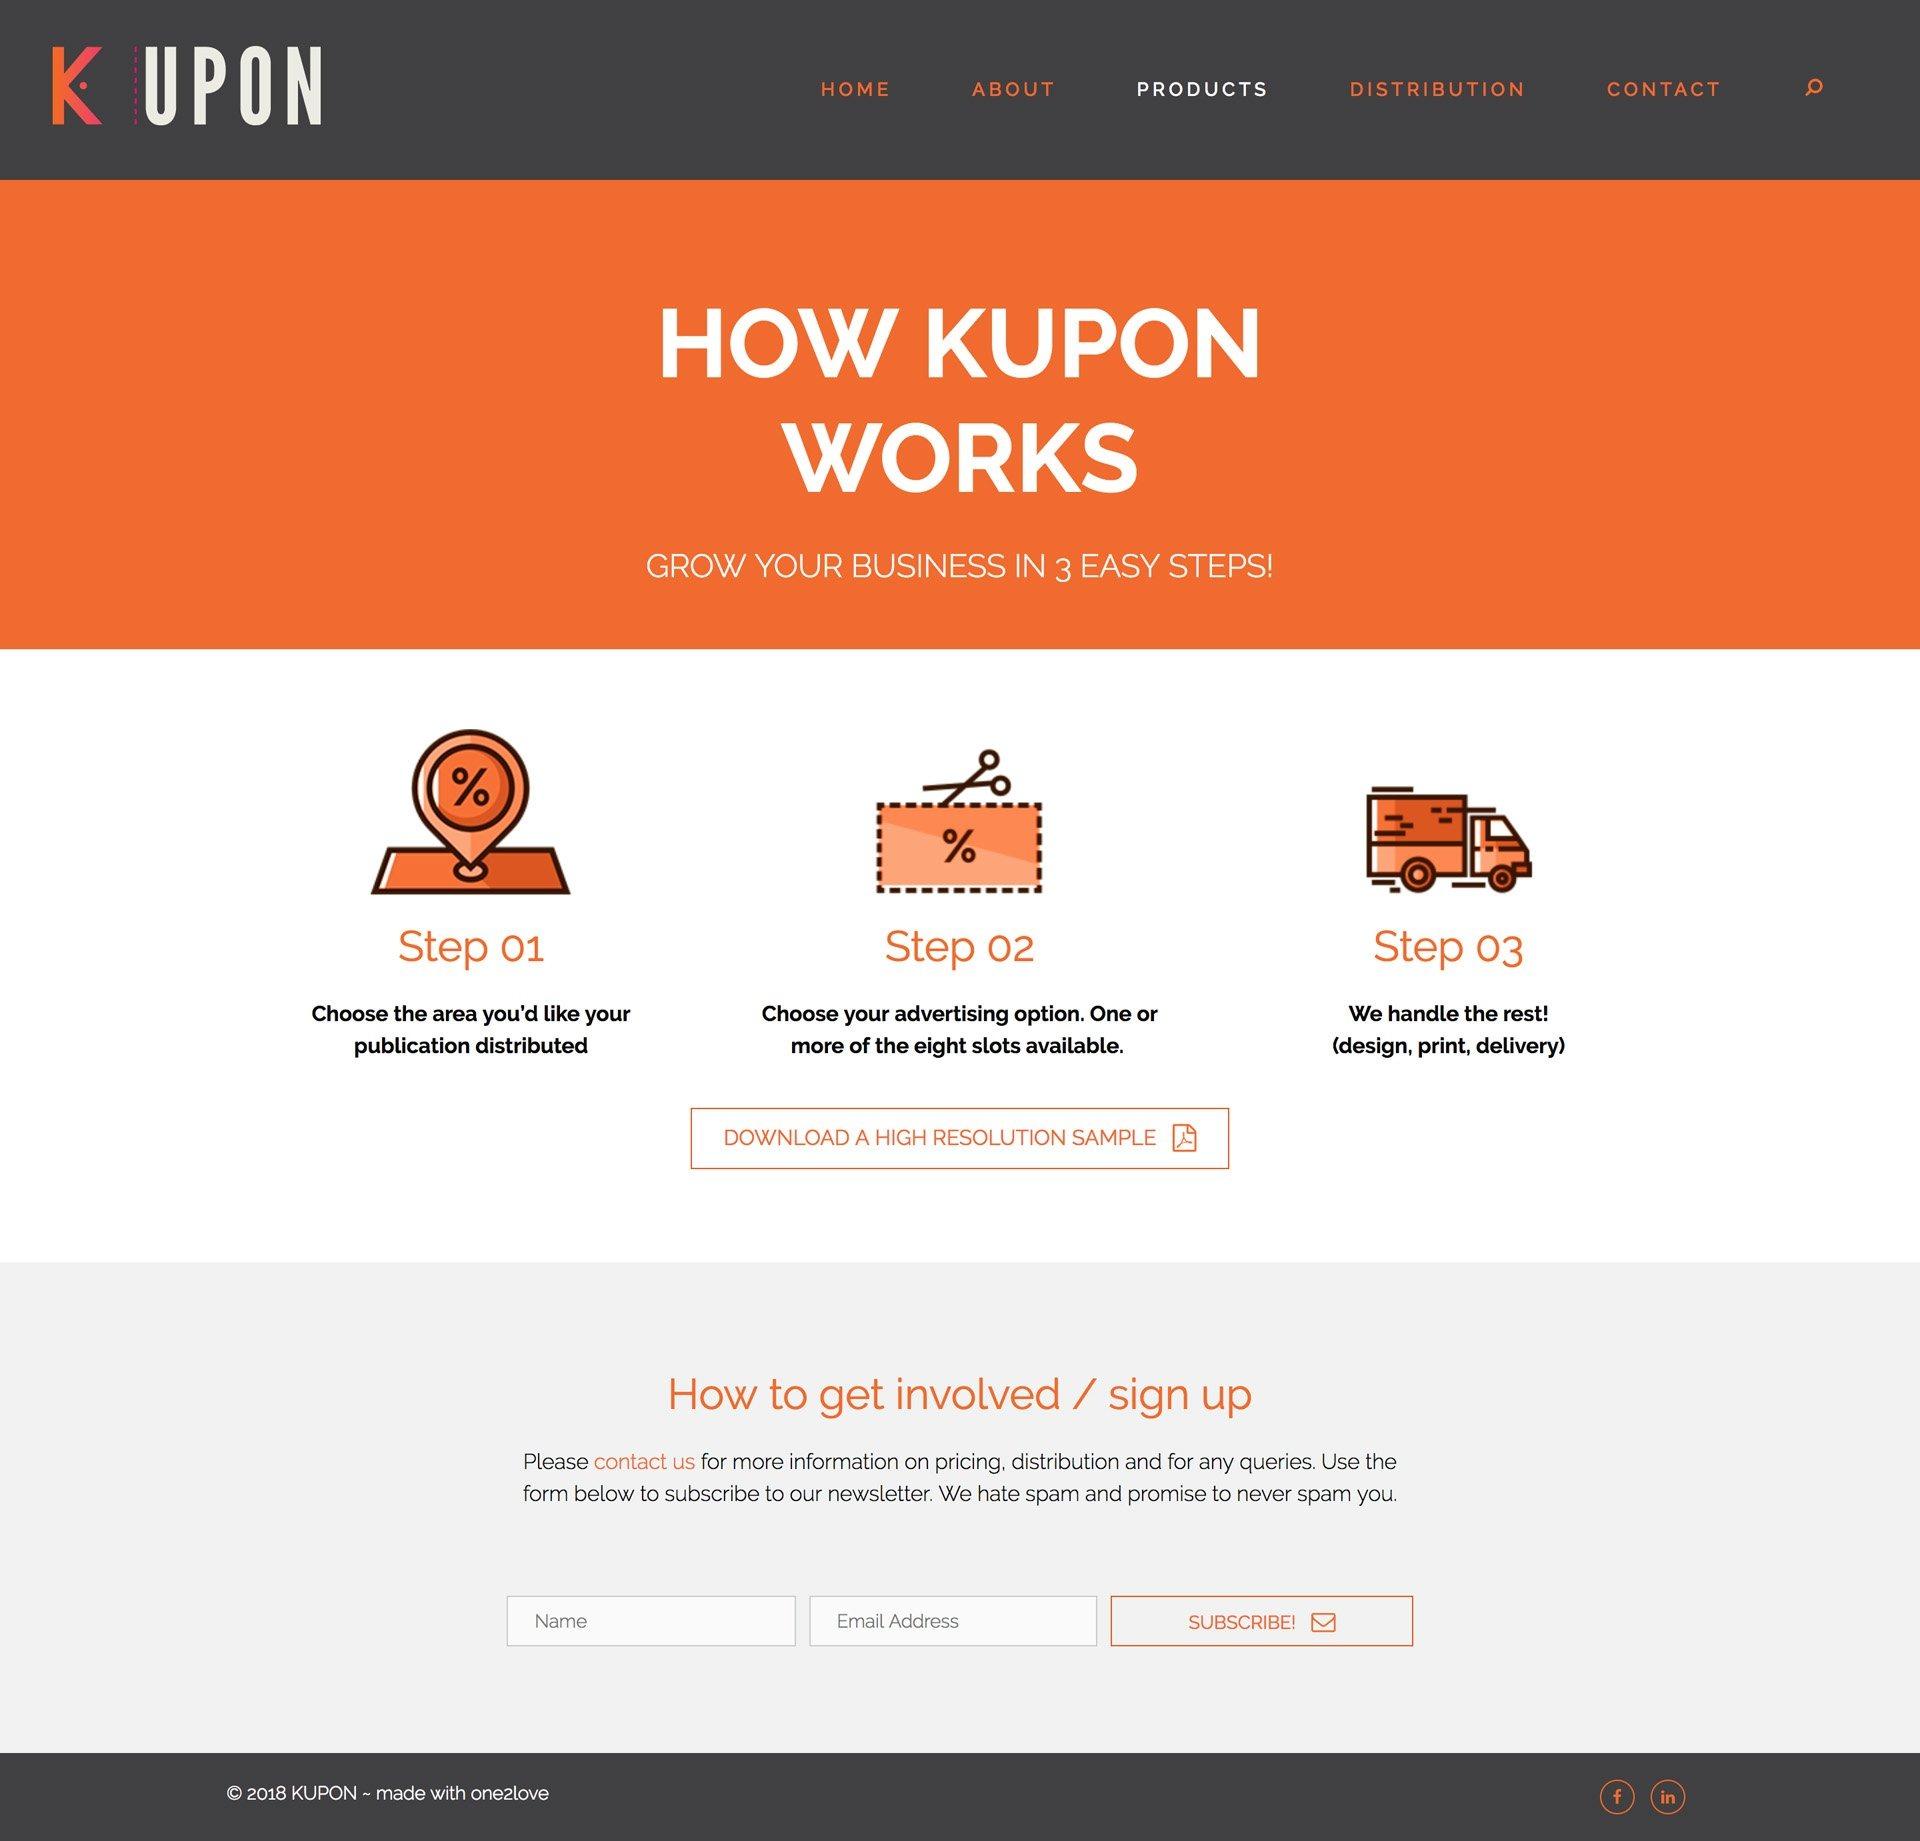 How Kupon Works Page